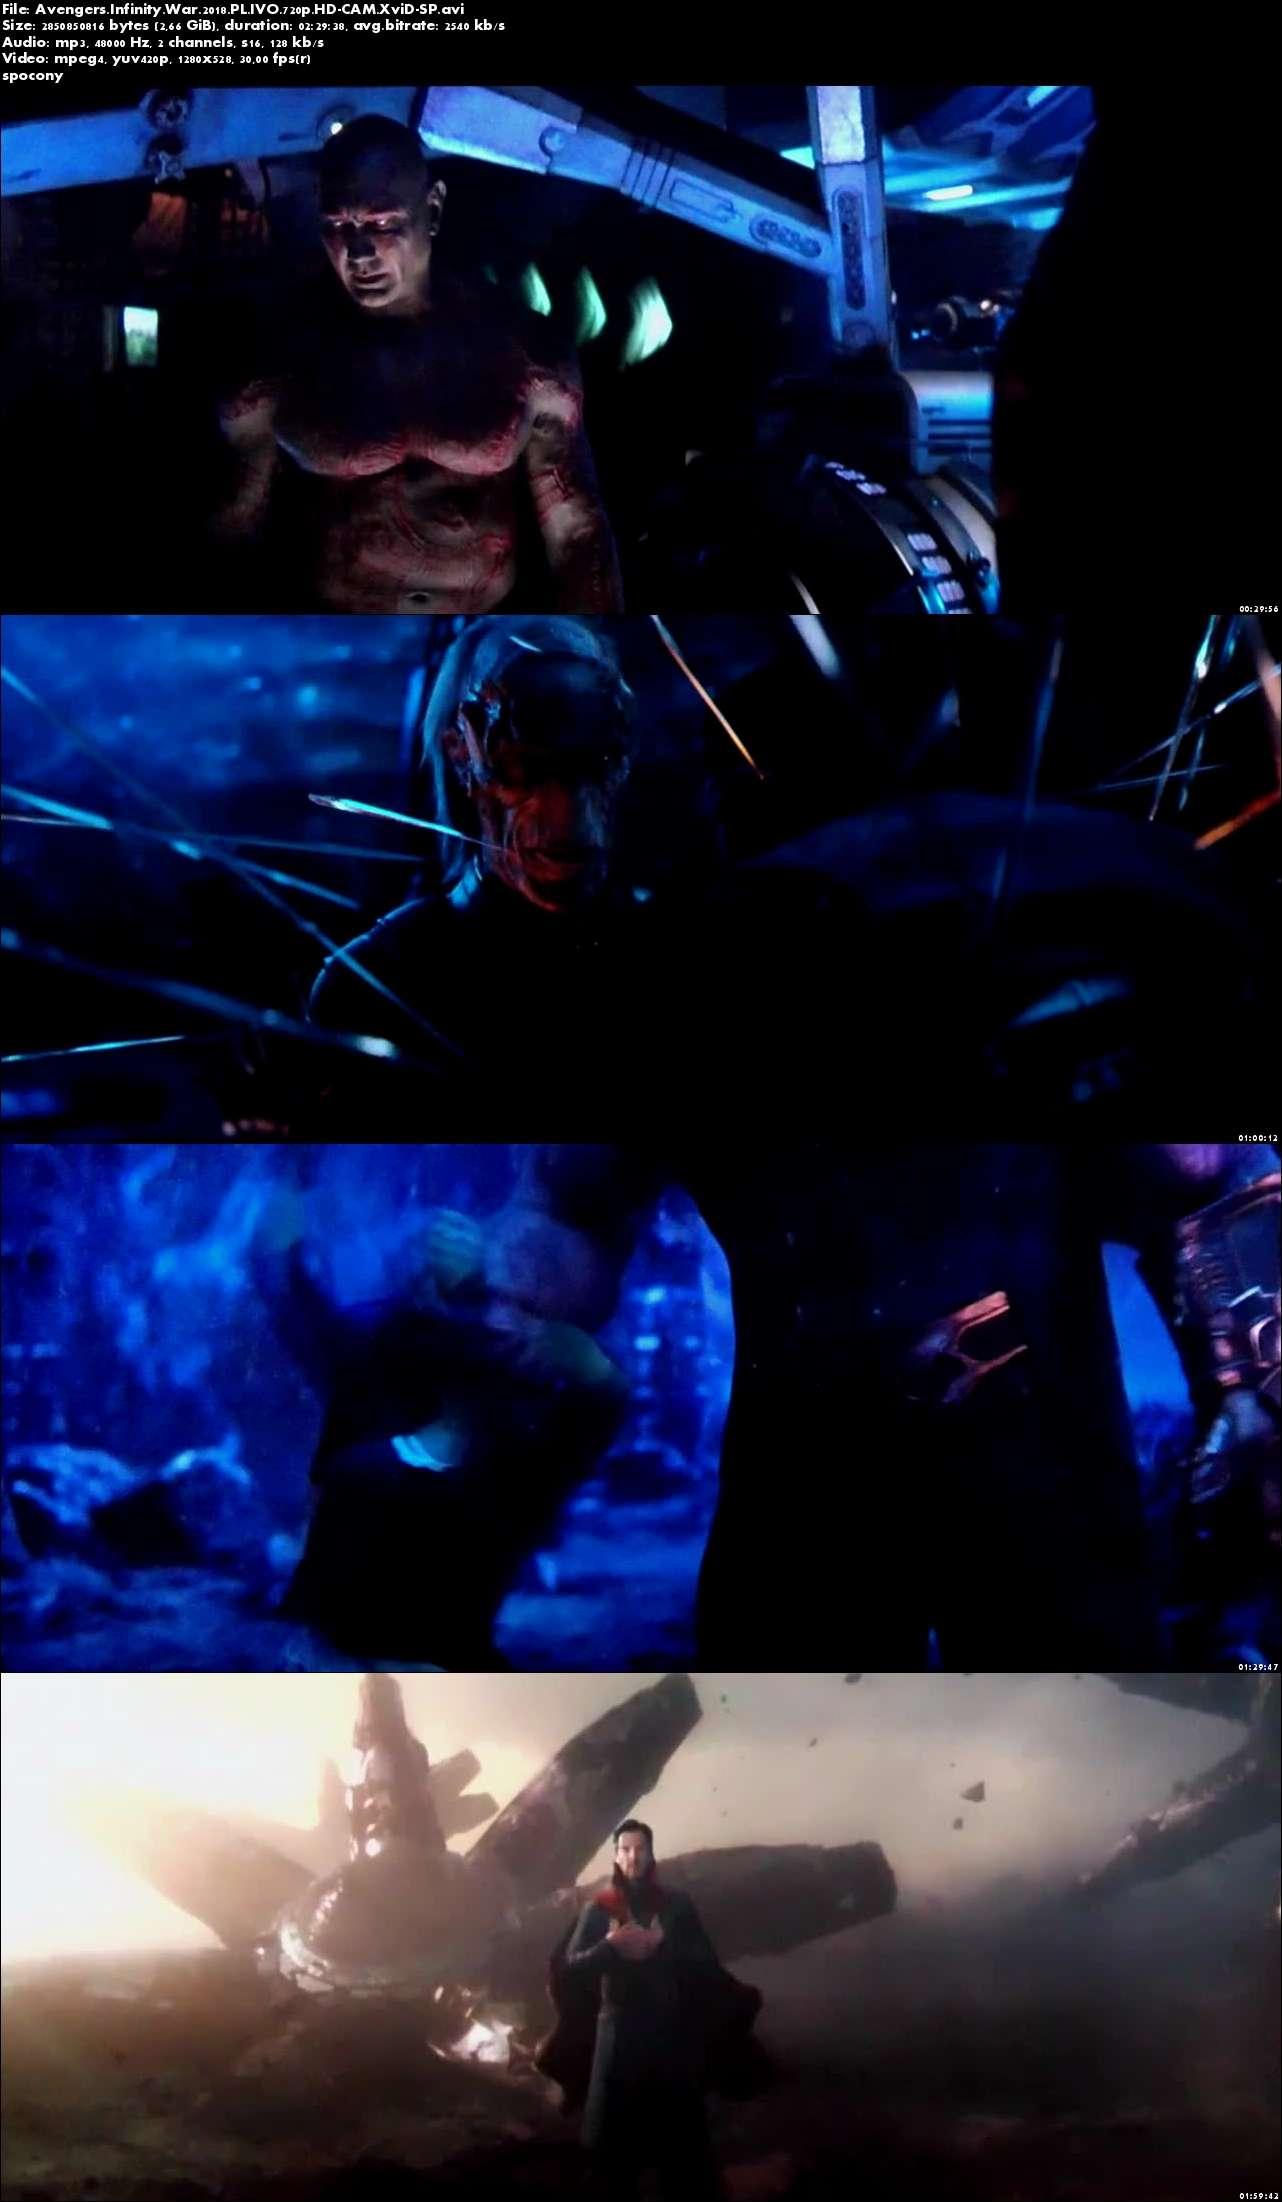 Avengers: Wojna bez granic / Avengers: Infinity War (2018) PL.IVO.720p.HD-CAM.XviD-SP [Lektor PL-IVO]